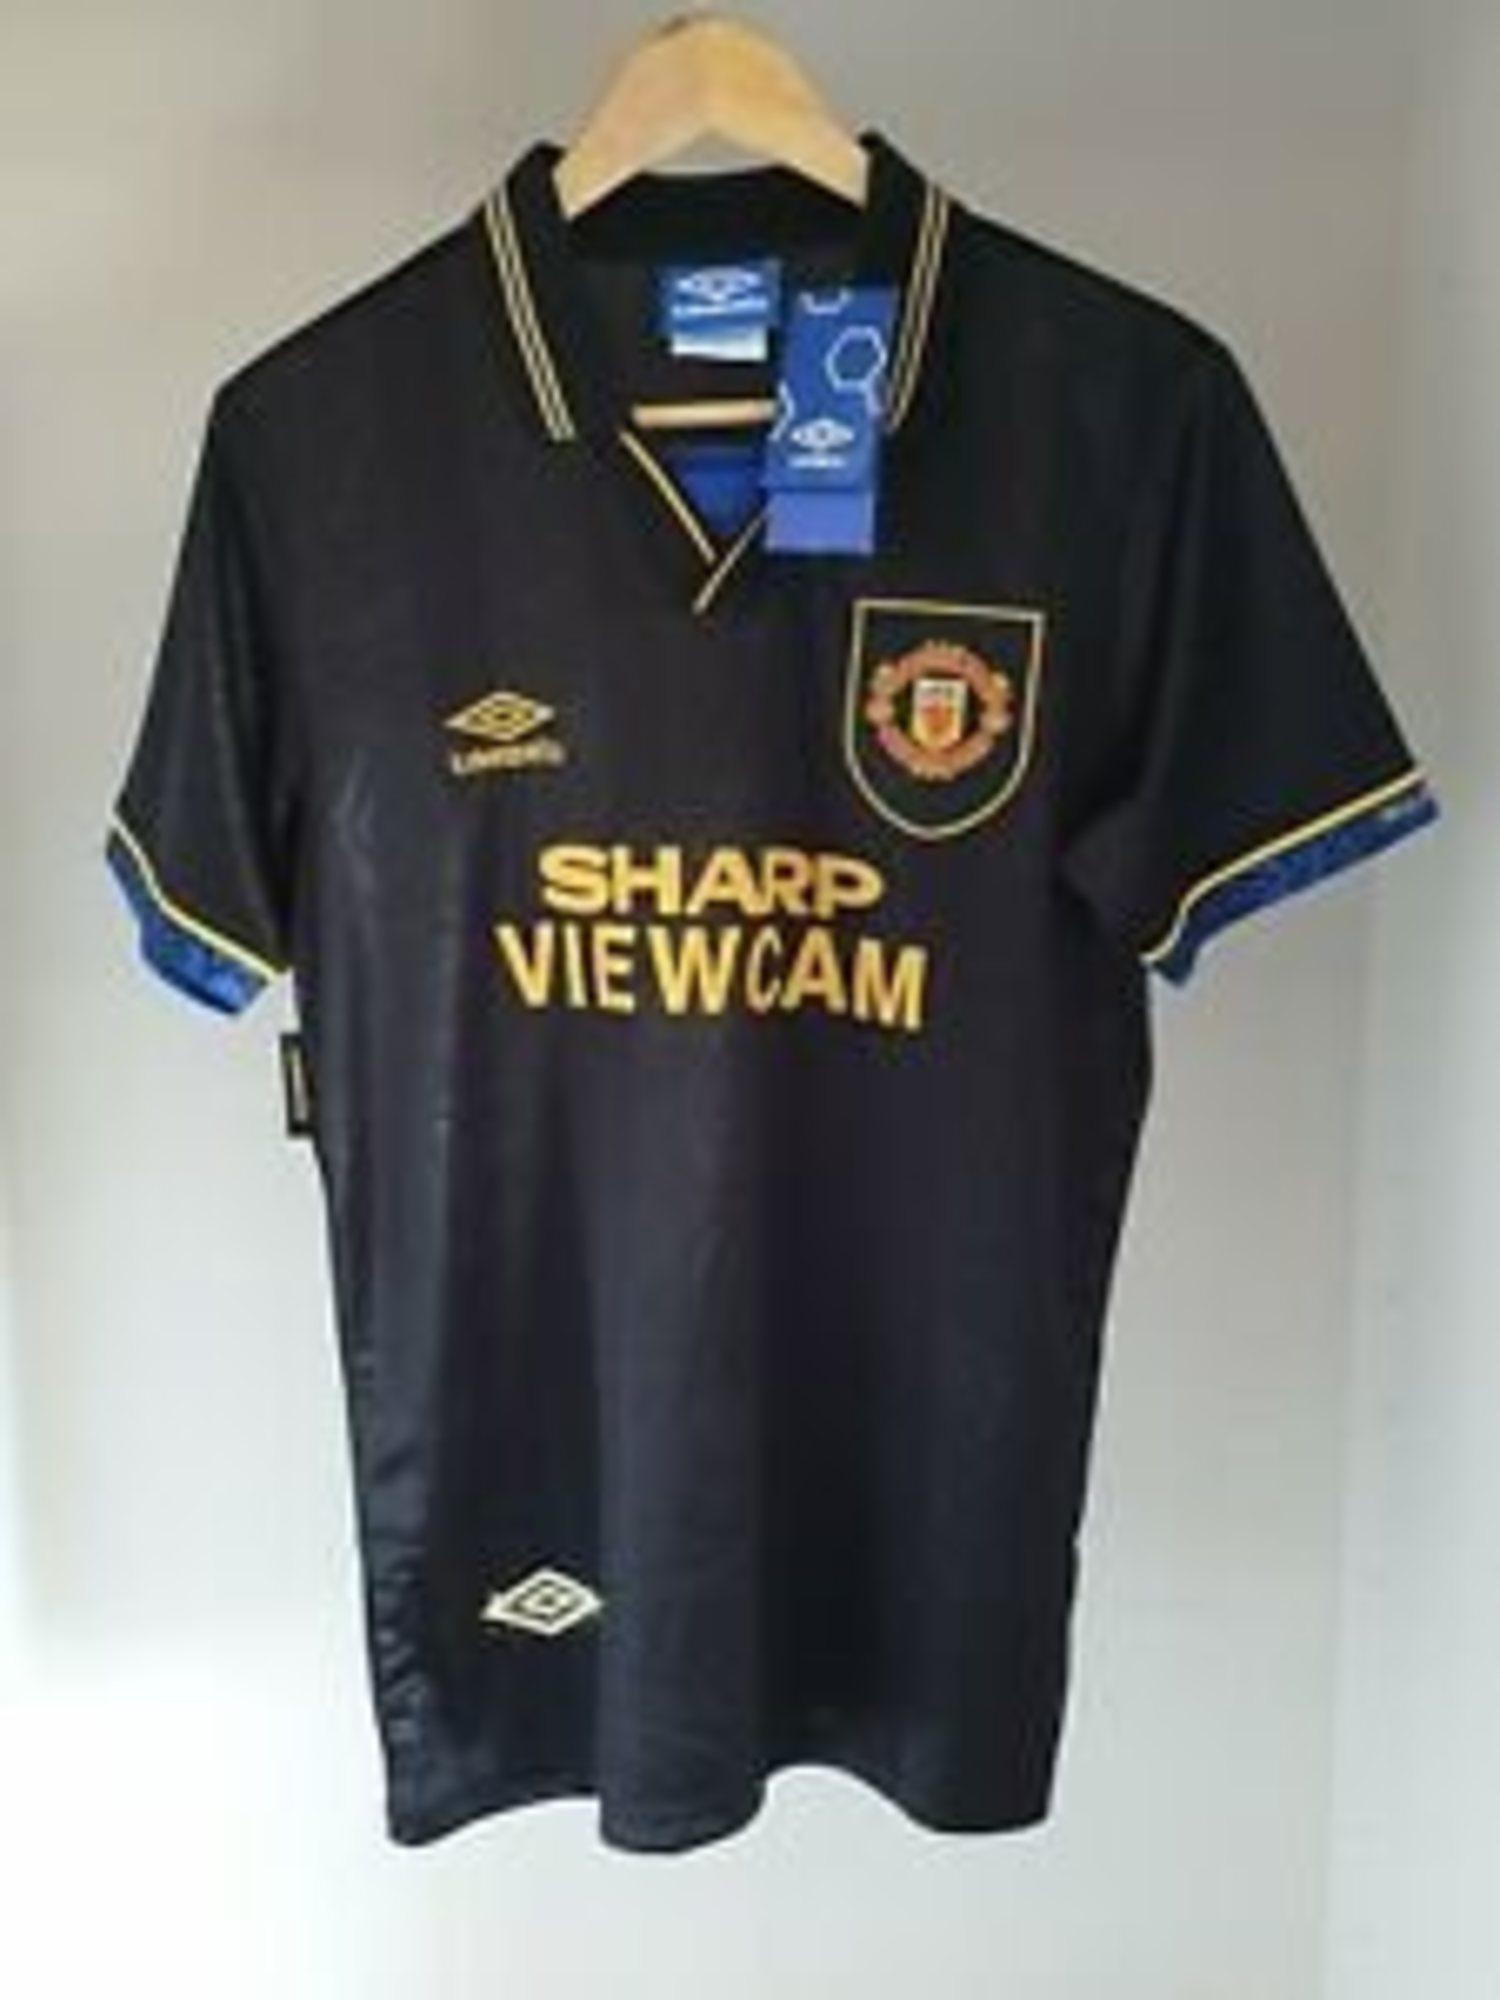 Camiseta del Manchester United de la temporada 93/94.